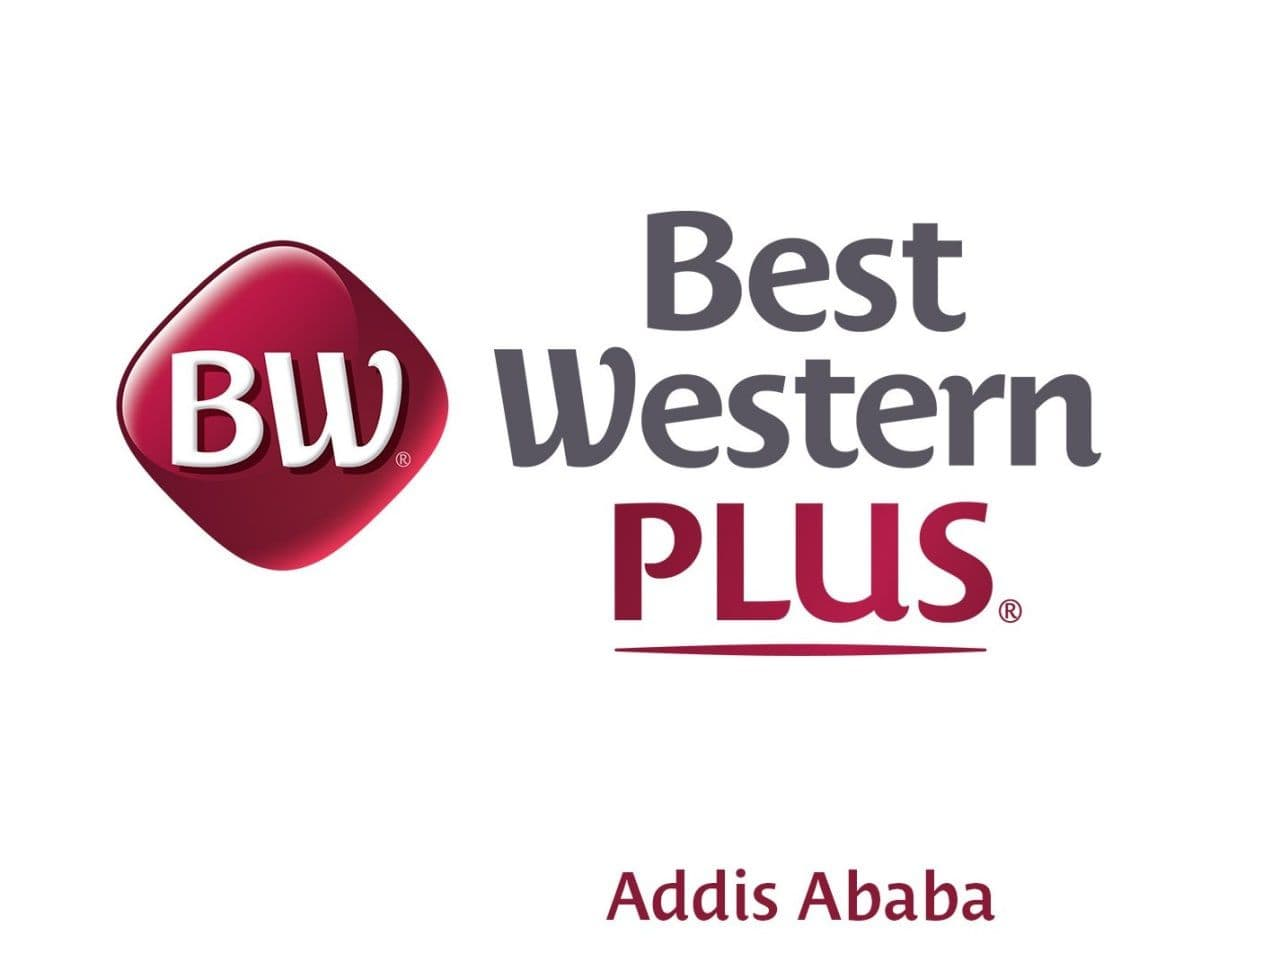 Best Western Plus Addis Ababa